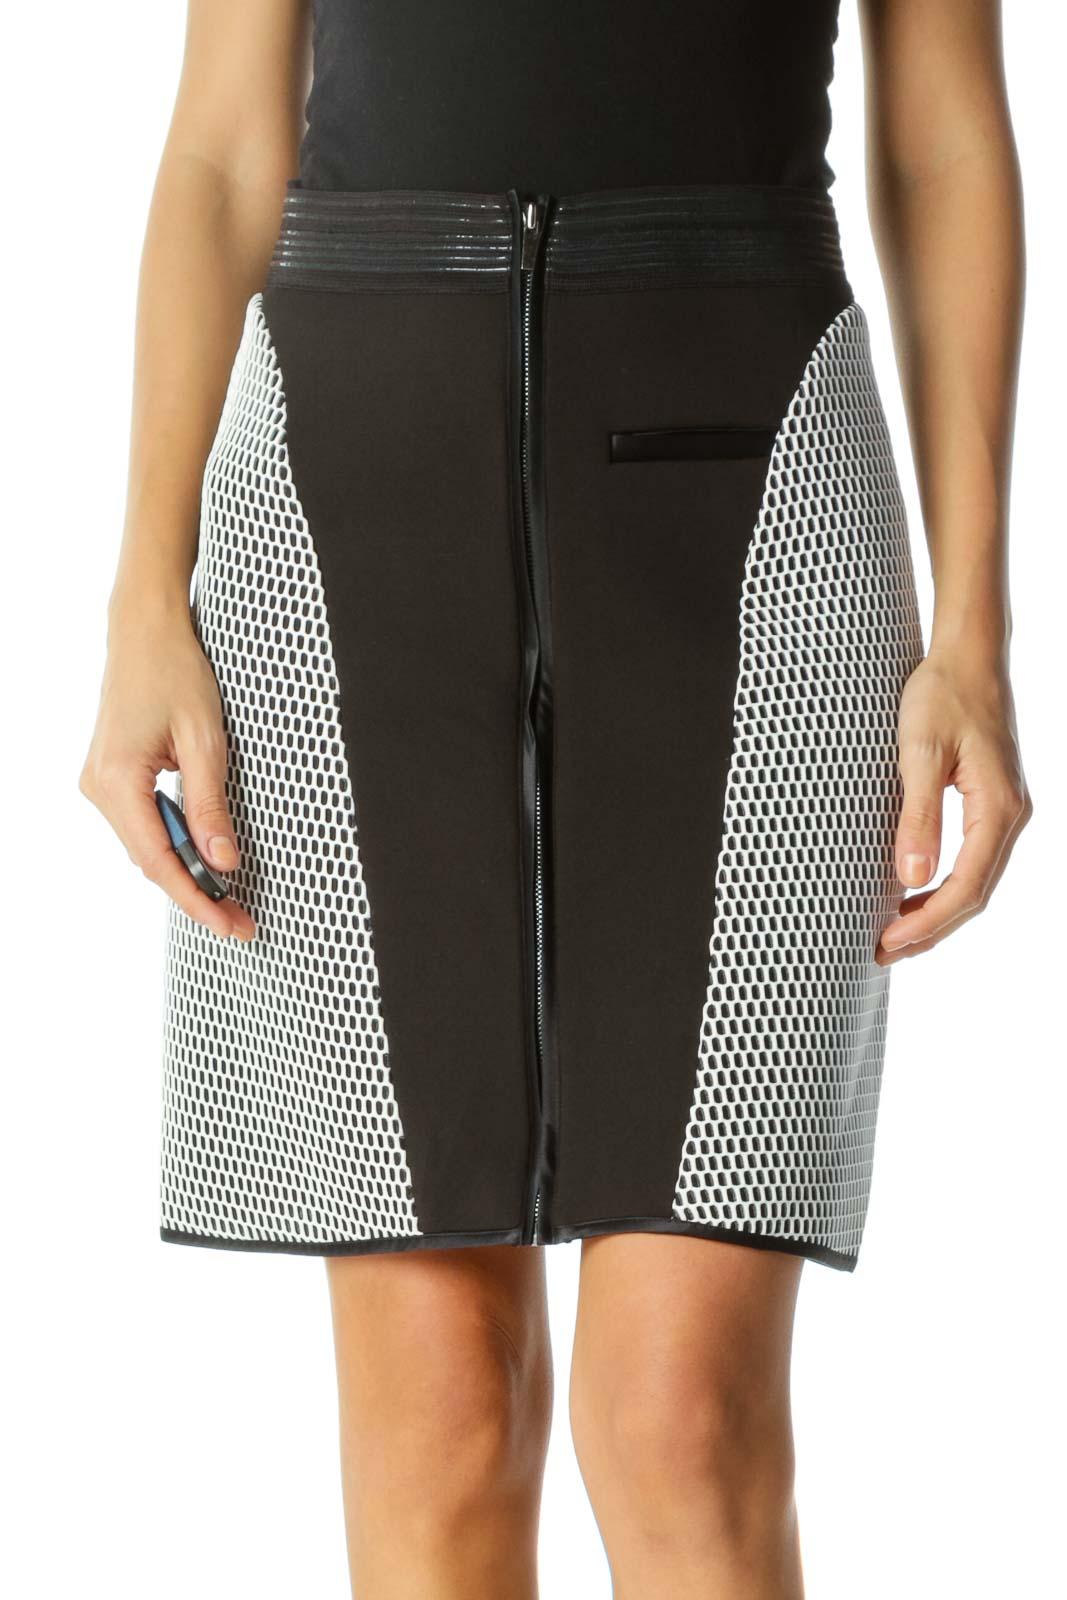 Black Elastic Stick-On Waist Applique Mesh Zippered Skirt Front